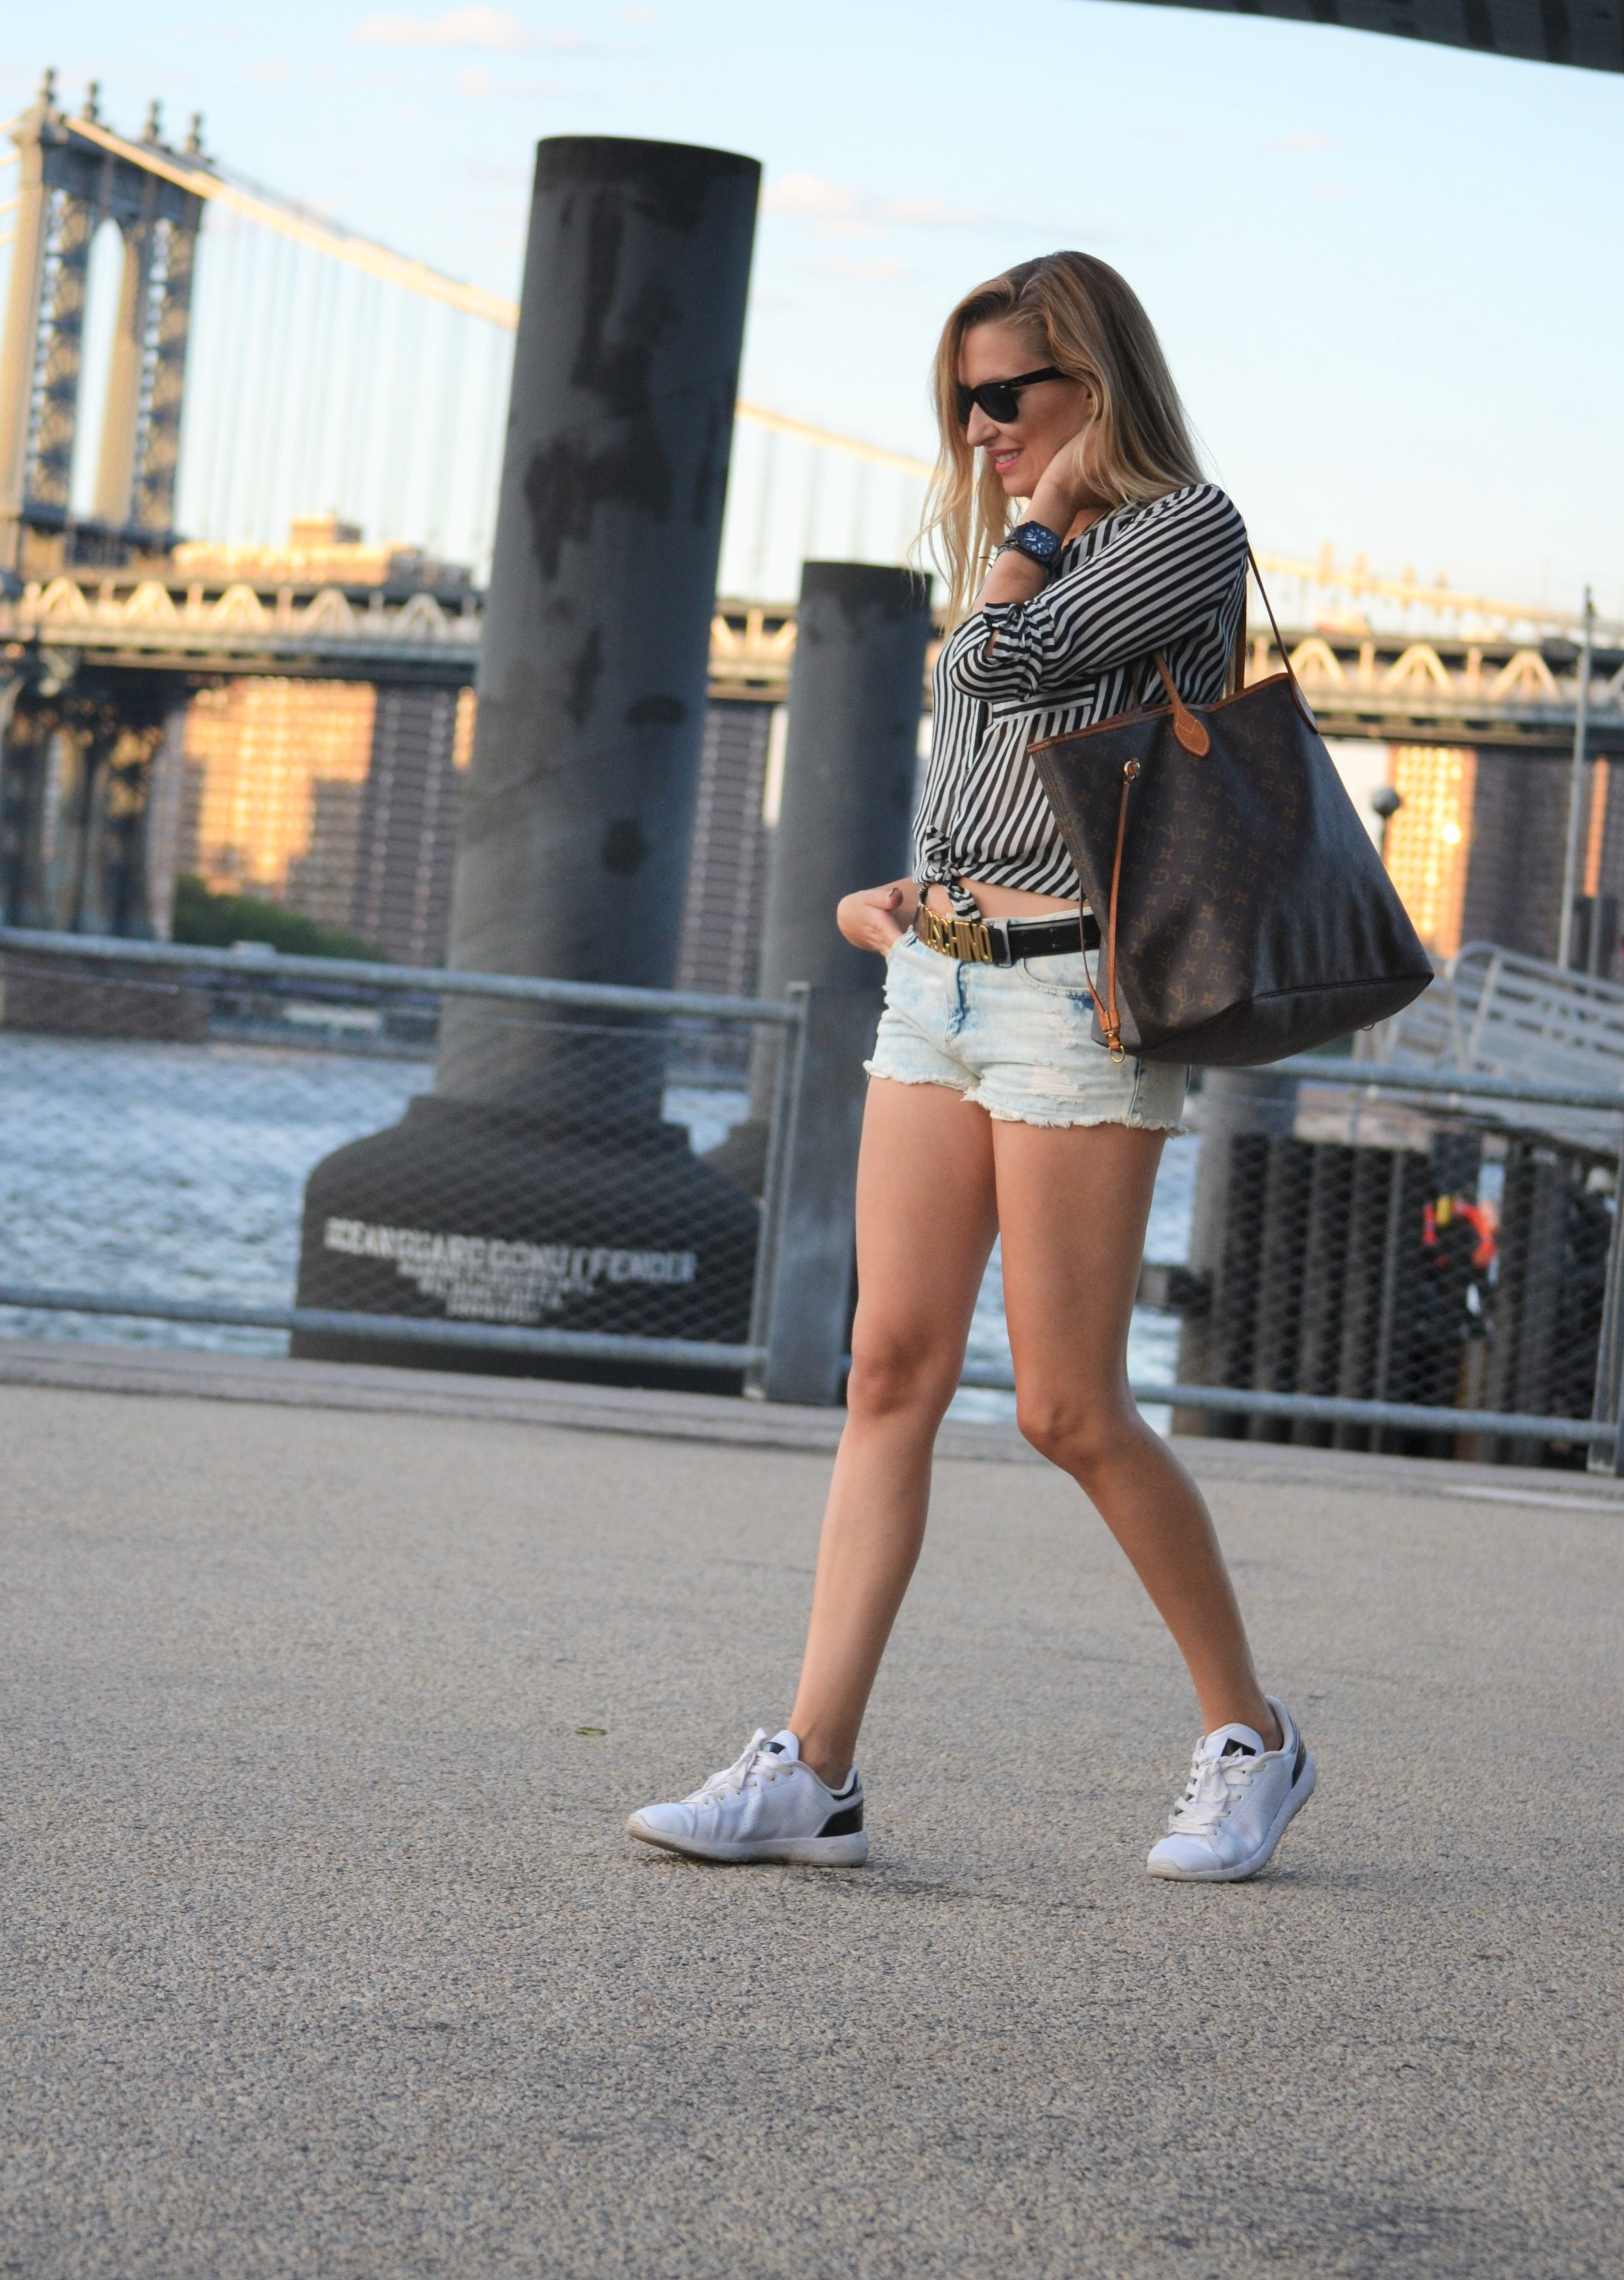 Dumbo_Brooklyn_Louis_Vuitton_Lara_Martin_Gilarranz_Bymyheels (6)